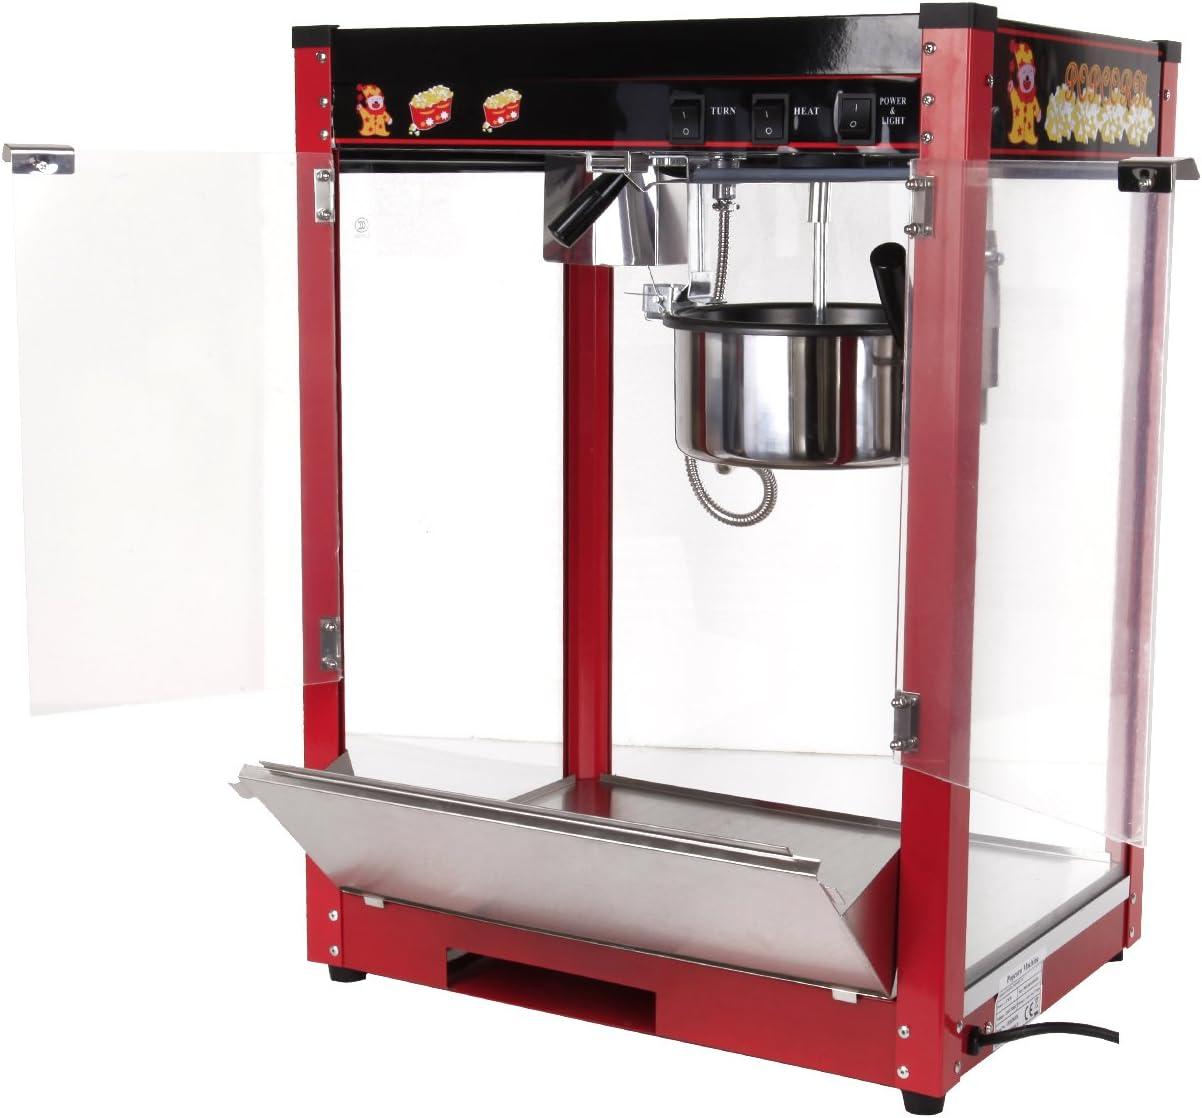 comercial Máquinas de palomitas eléctrico palomitas de maíz máquina del fabricante palomitas pop corn Maker 1370W Popper máquina palomitas automático 1/2 (pan/min)